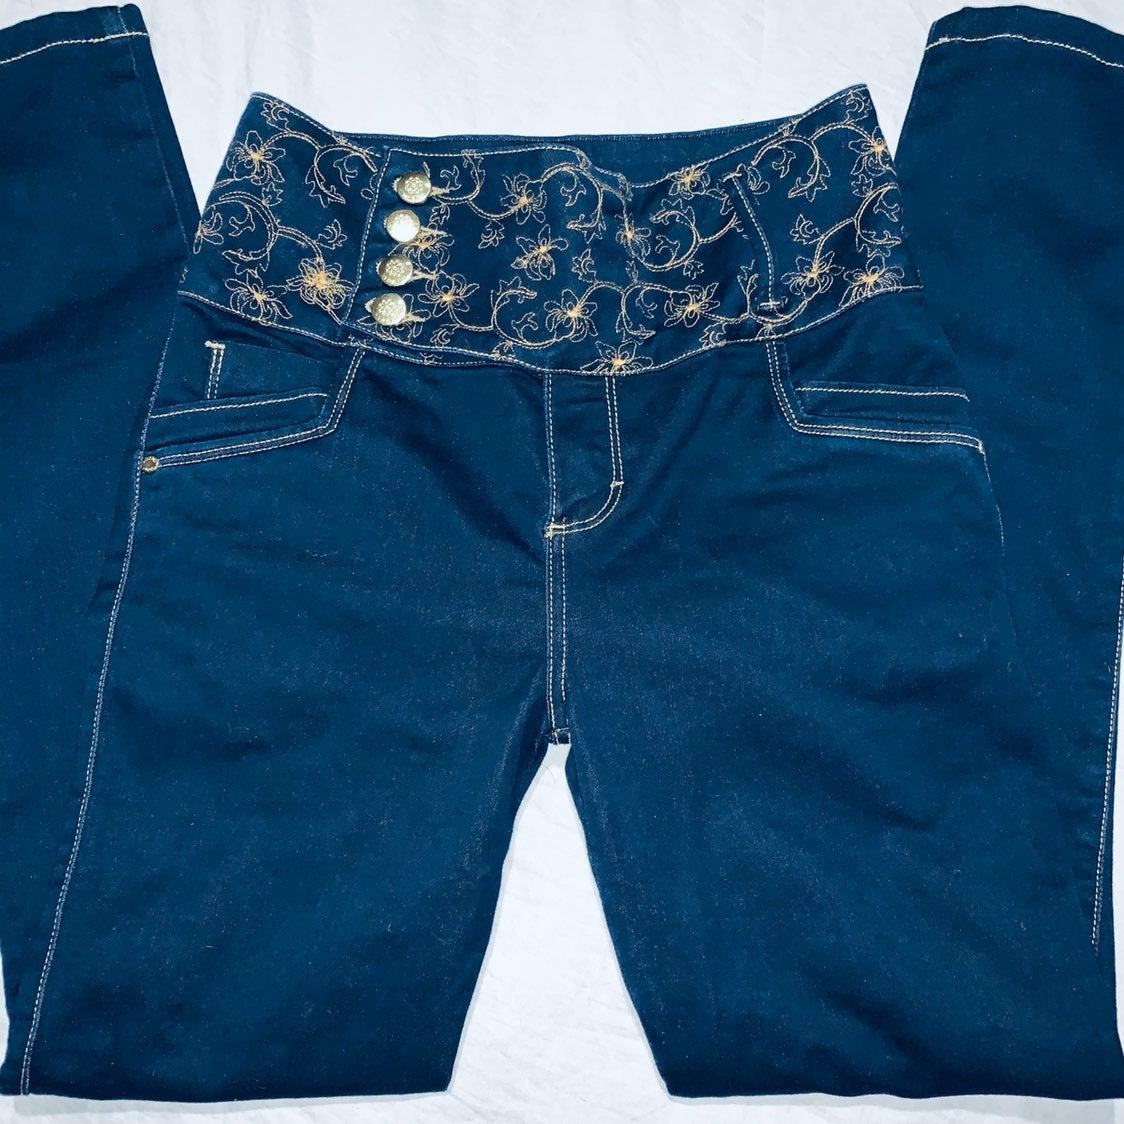 Culumbian butt lifting jeans